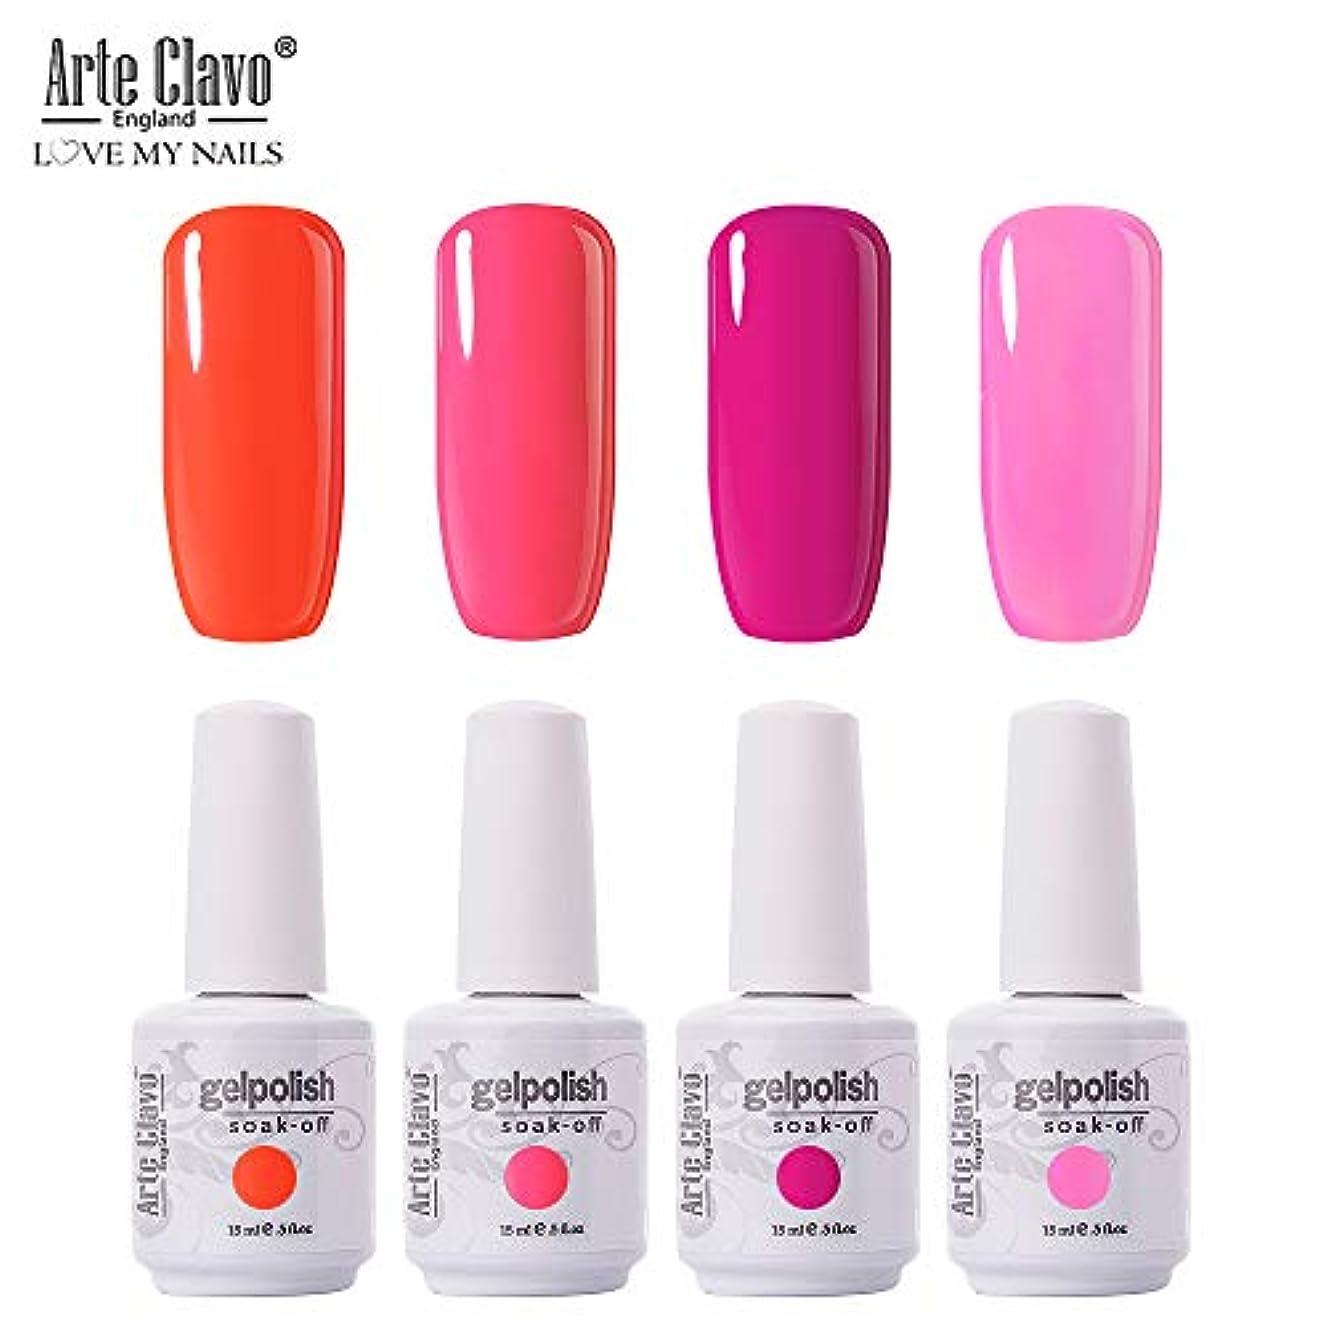 Arte Clavo 15ml Varnish Soak Off UV Led Nail Gel Polish Nail Art Salon Set 16 of 4 Colors